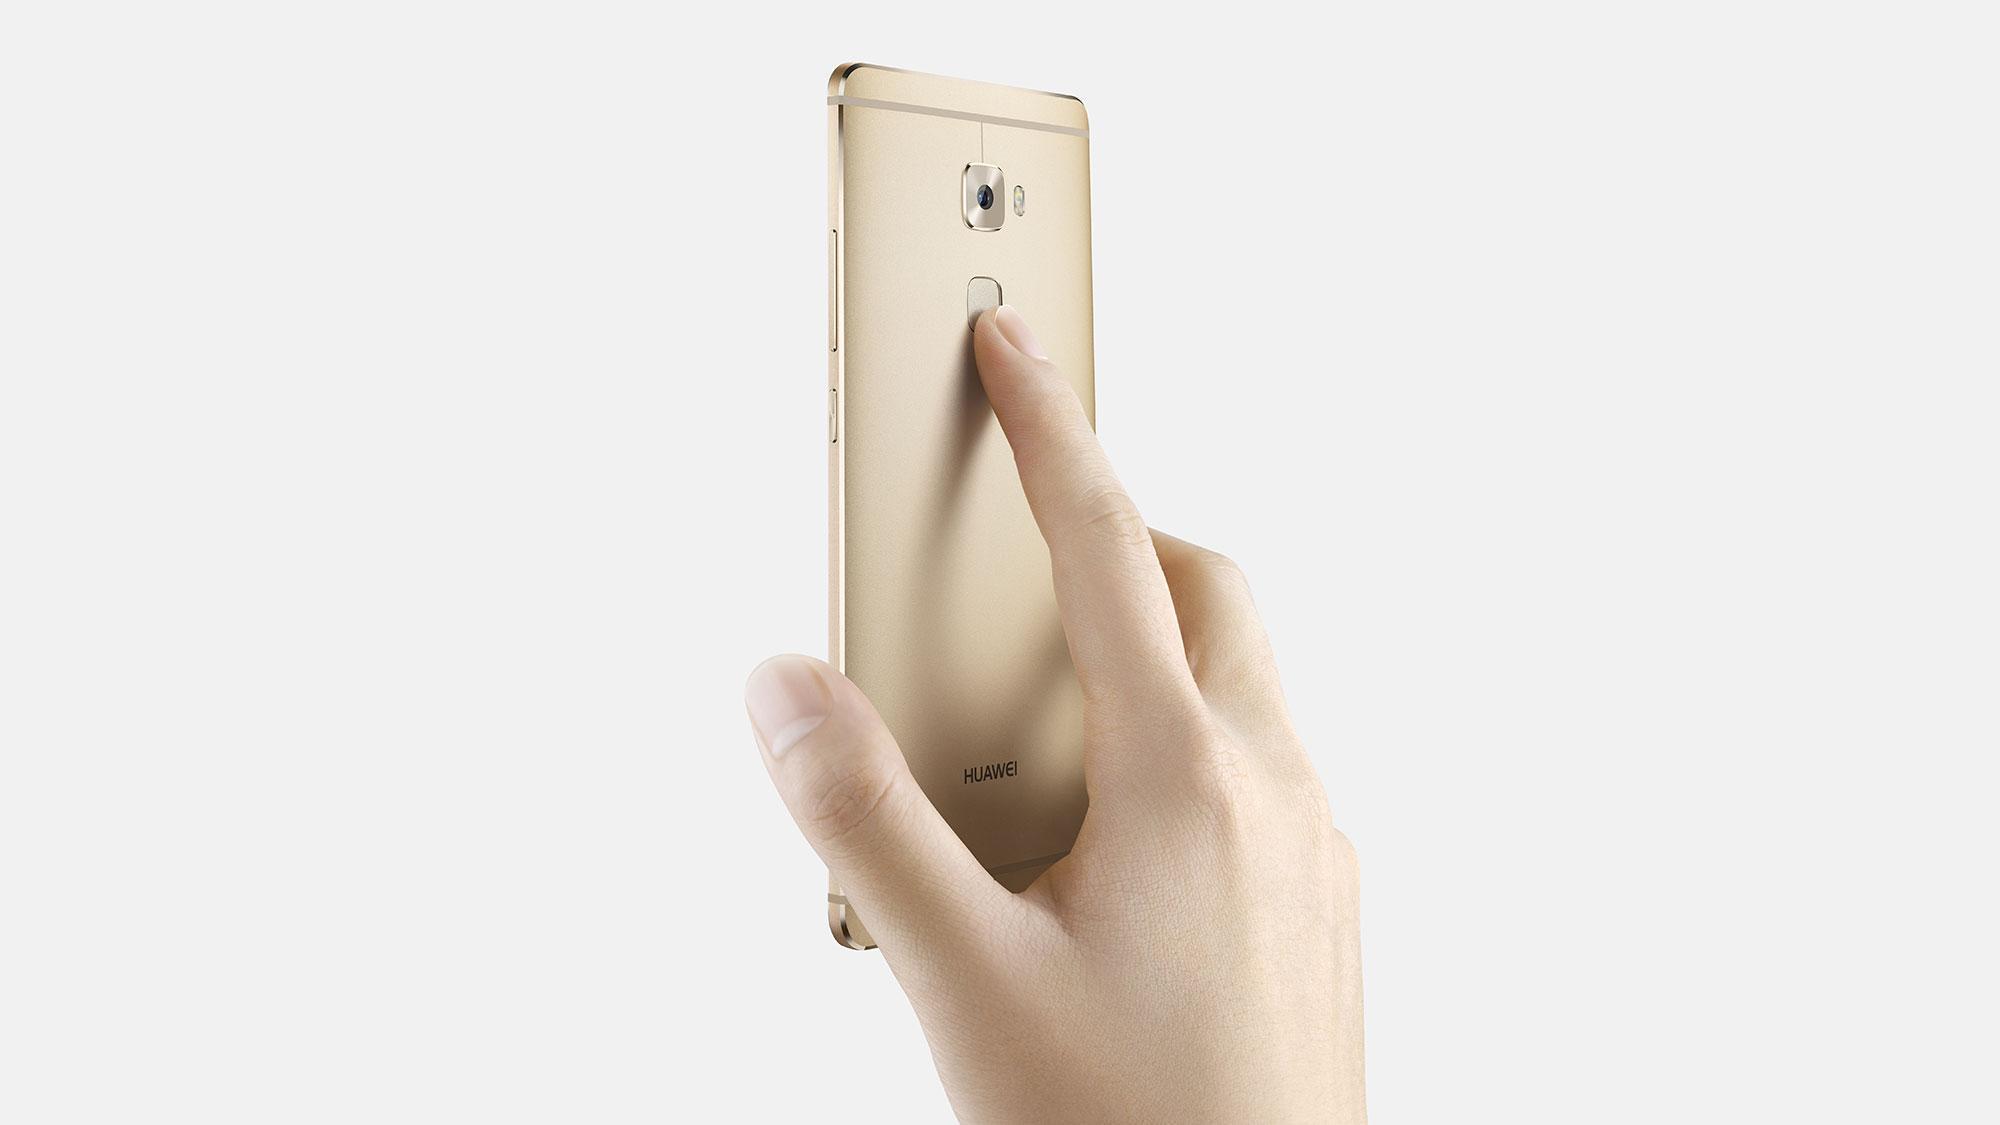 Huawei Mate S huella dactilar